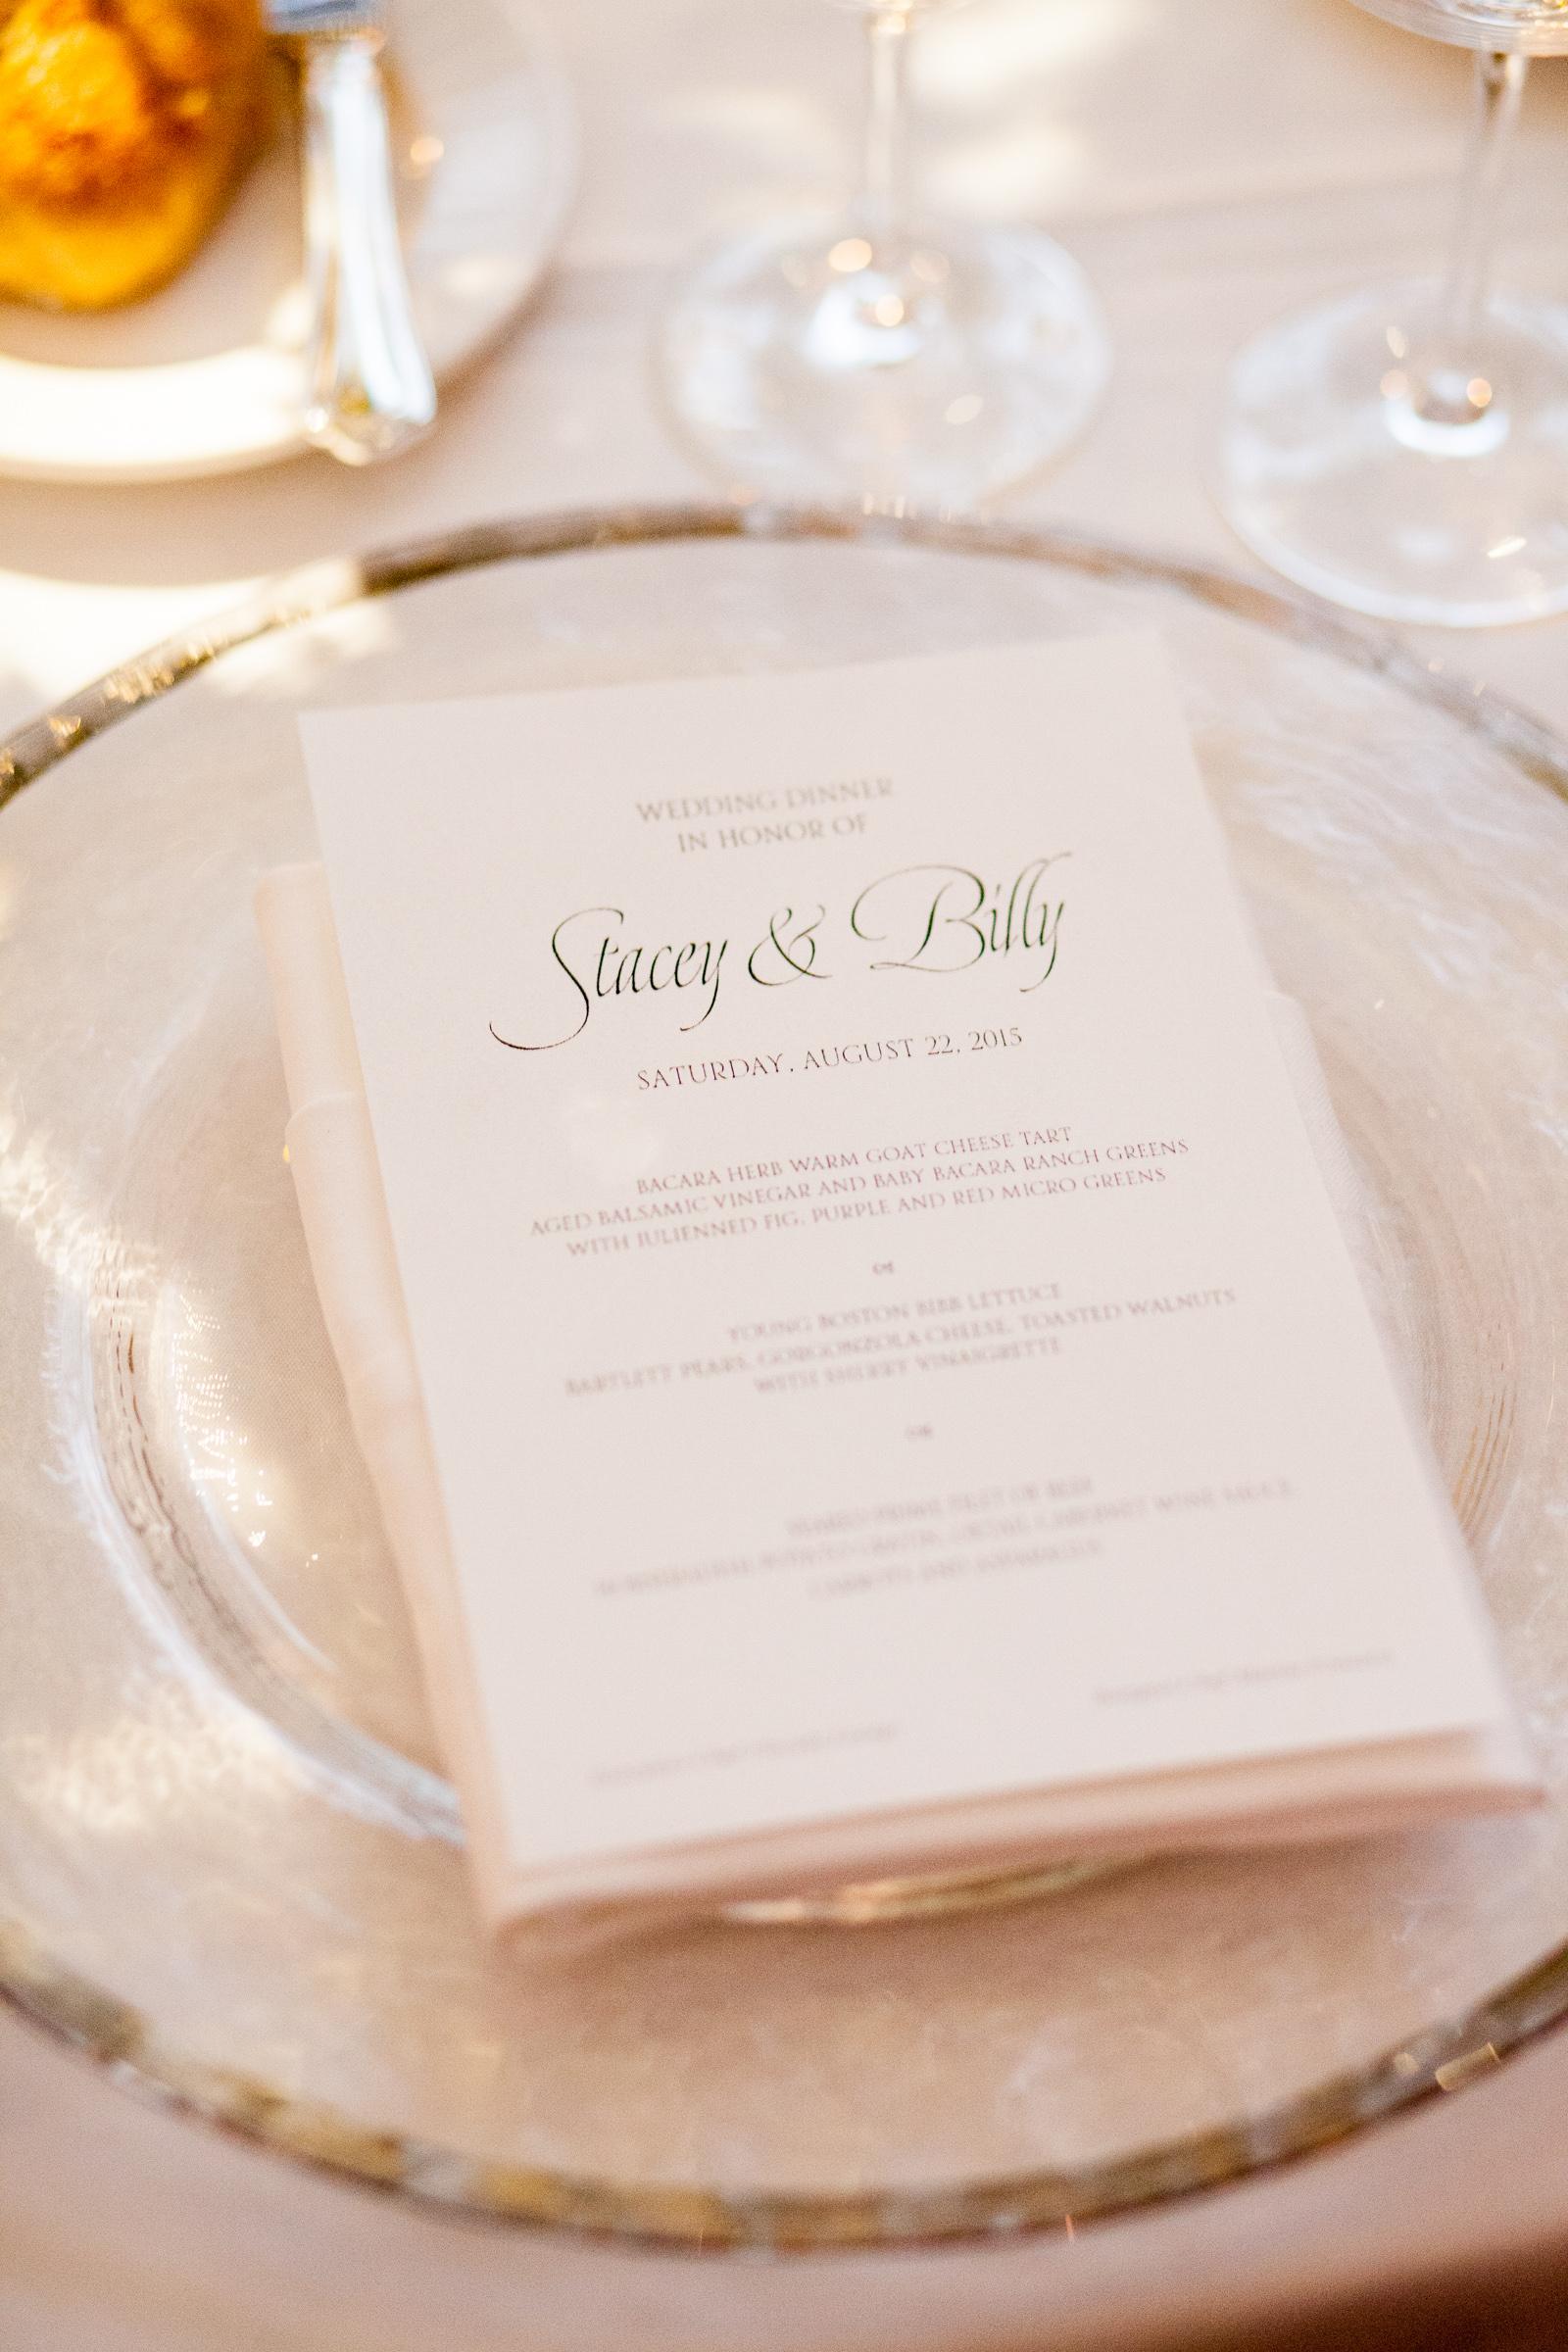 magnoliaeventdesign.com | Bacara Resort and Spa Wedding in Santa Barbara | Magnolia Event Design | Melissa Musgrove Photography